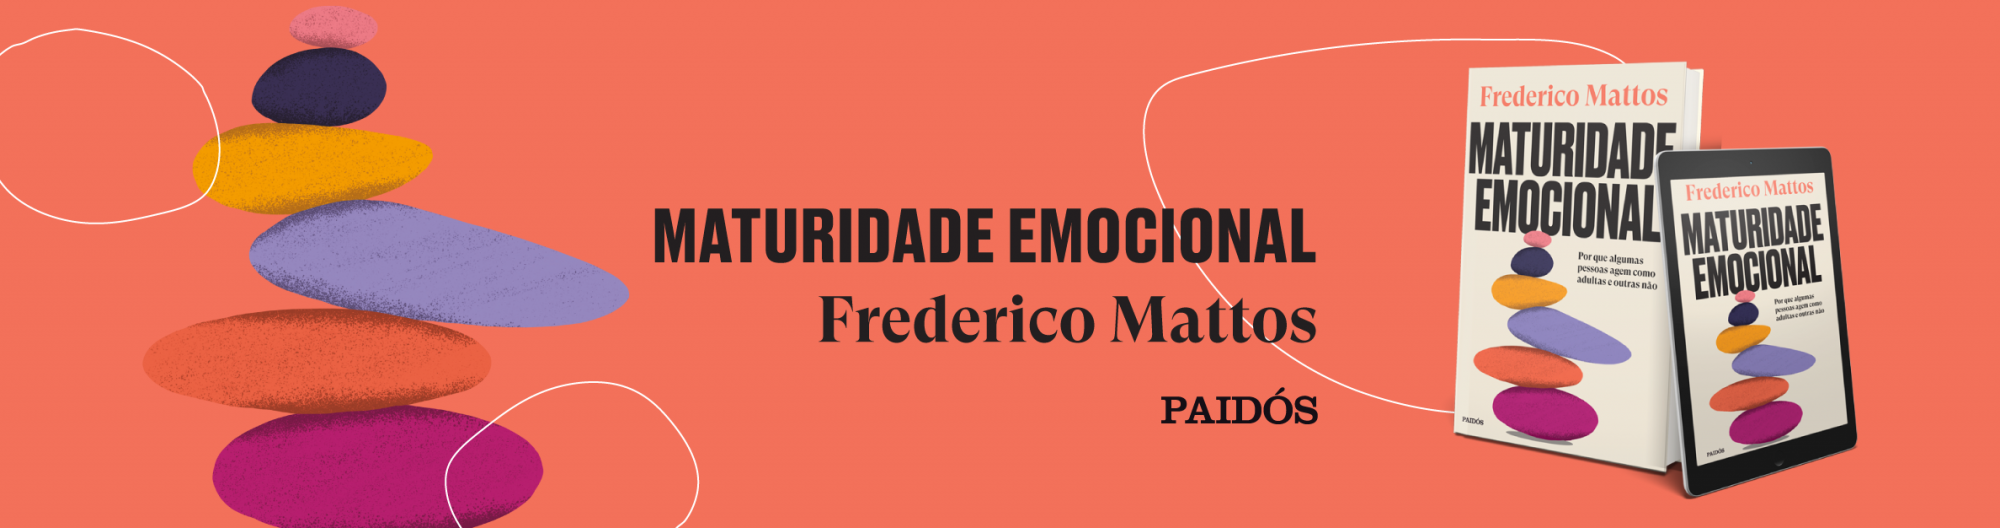 258_1_Maturidade_emocional_BANNER_1140X300.png